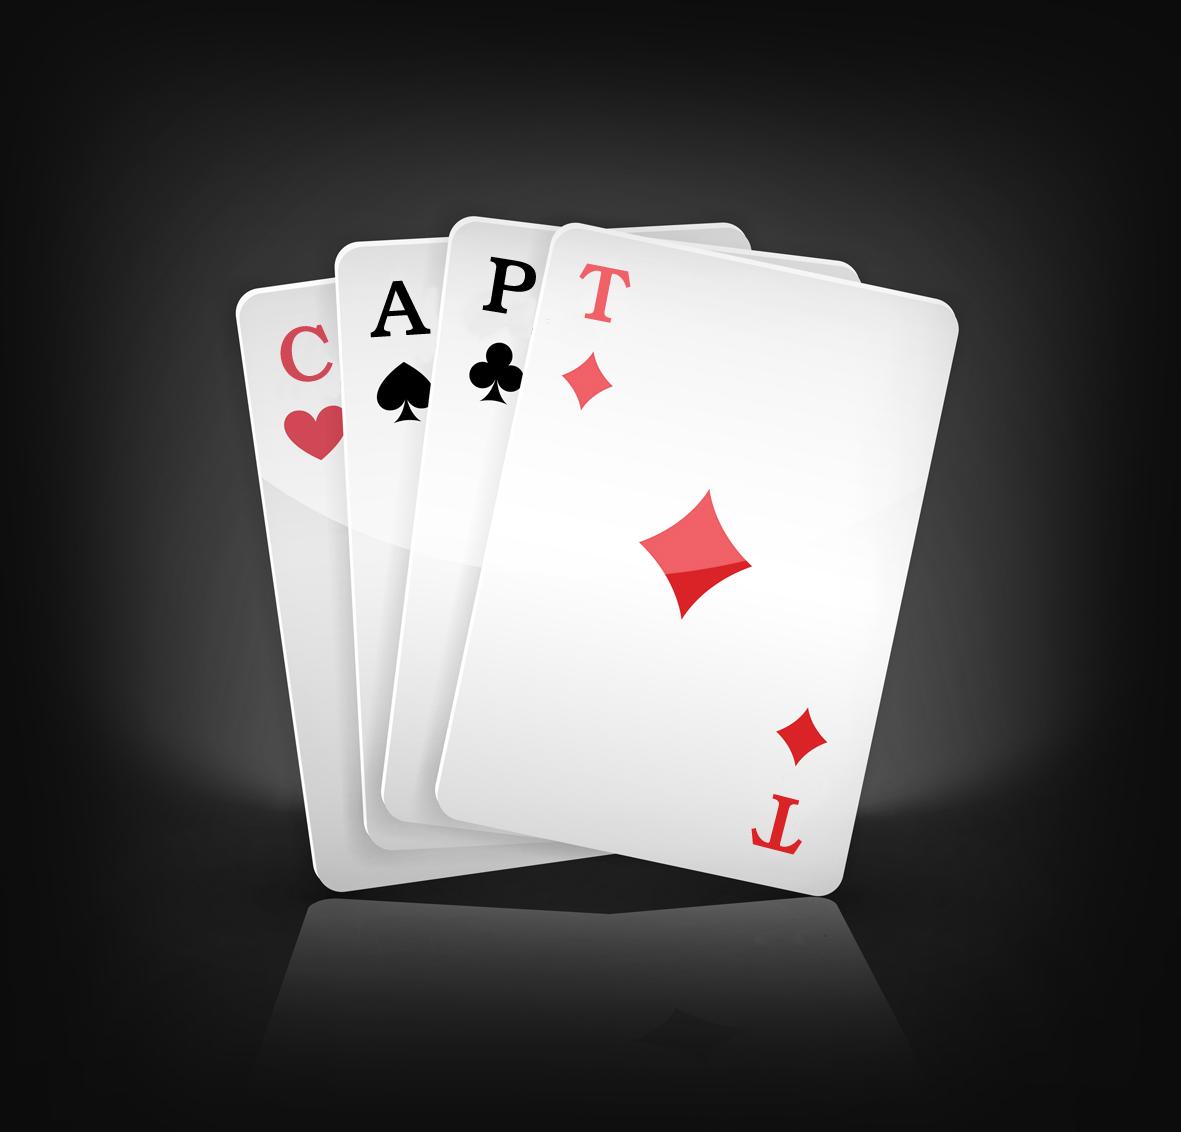 Casinos austria poker tour capt casino silver strikes